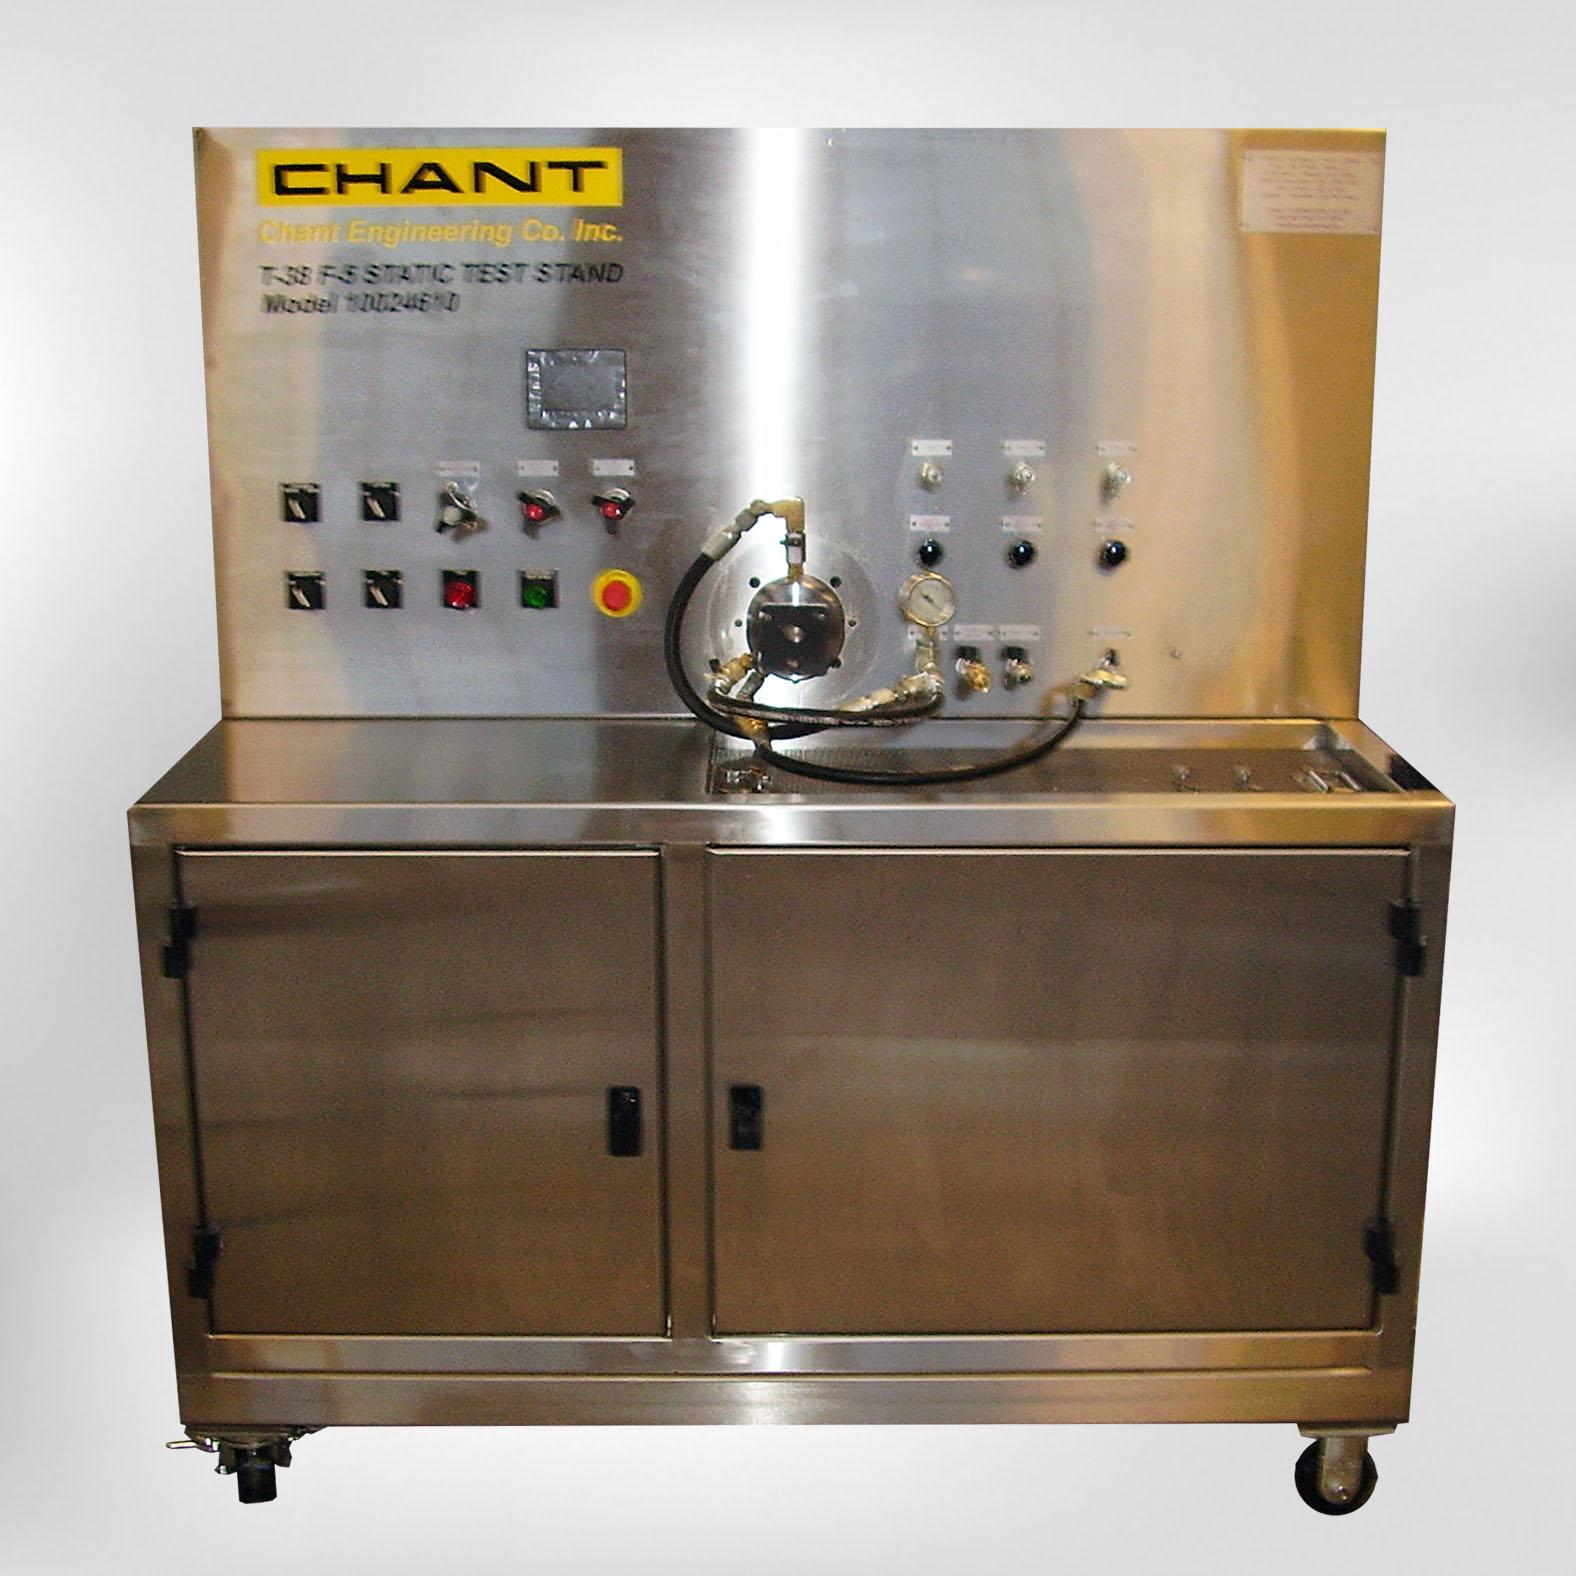 10024610 Static Hydraulic Test Stand